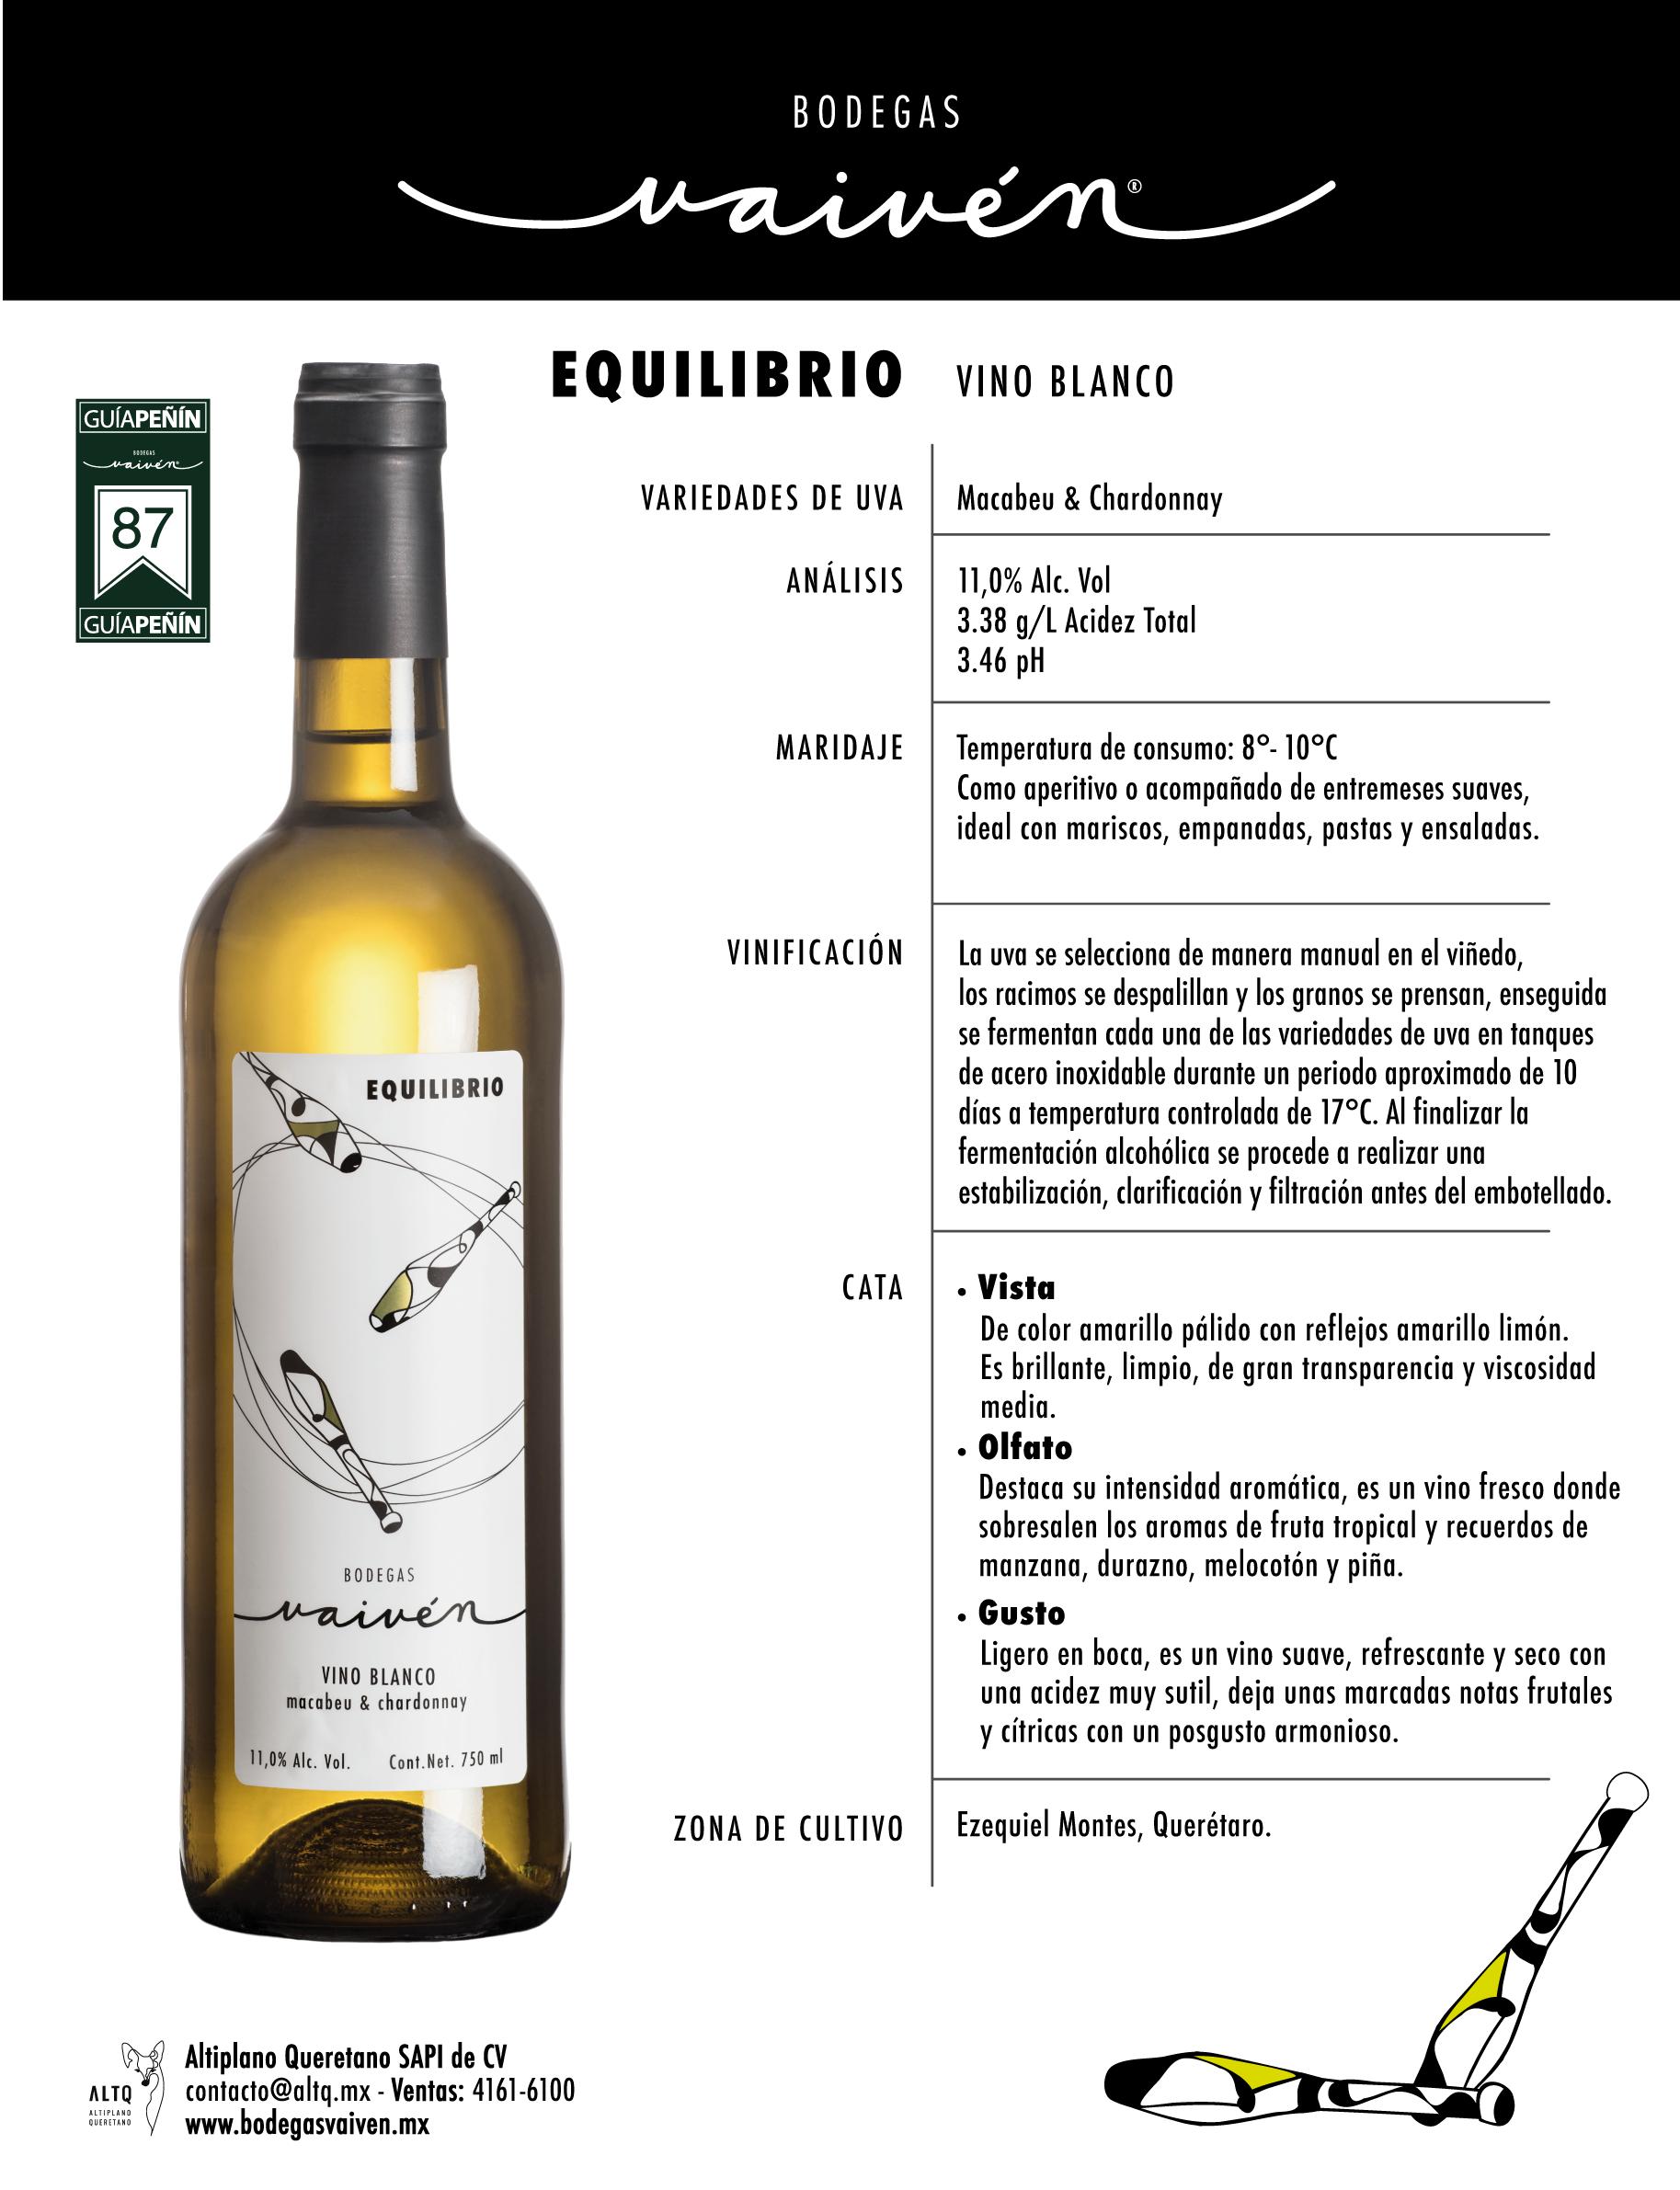 Equilibrio Vino Blanco